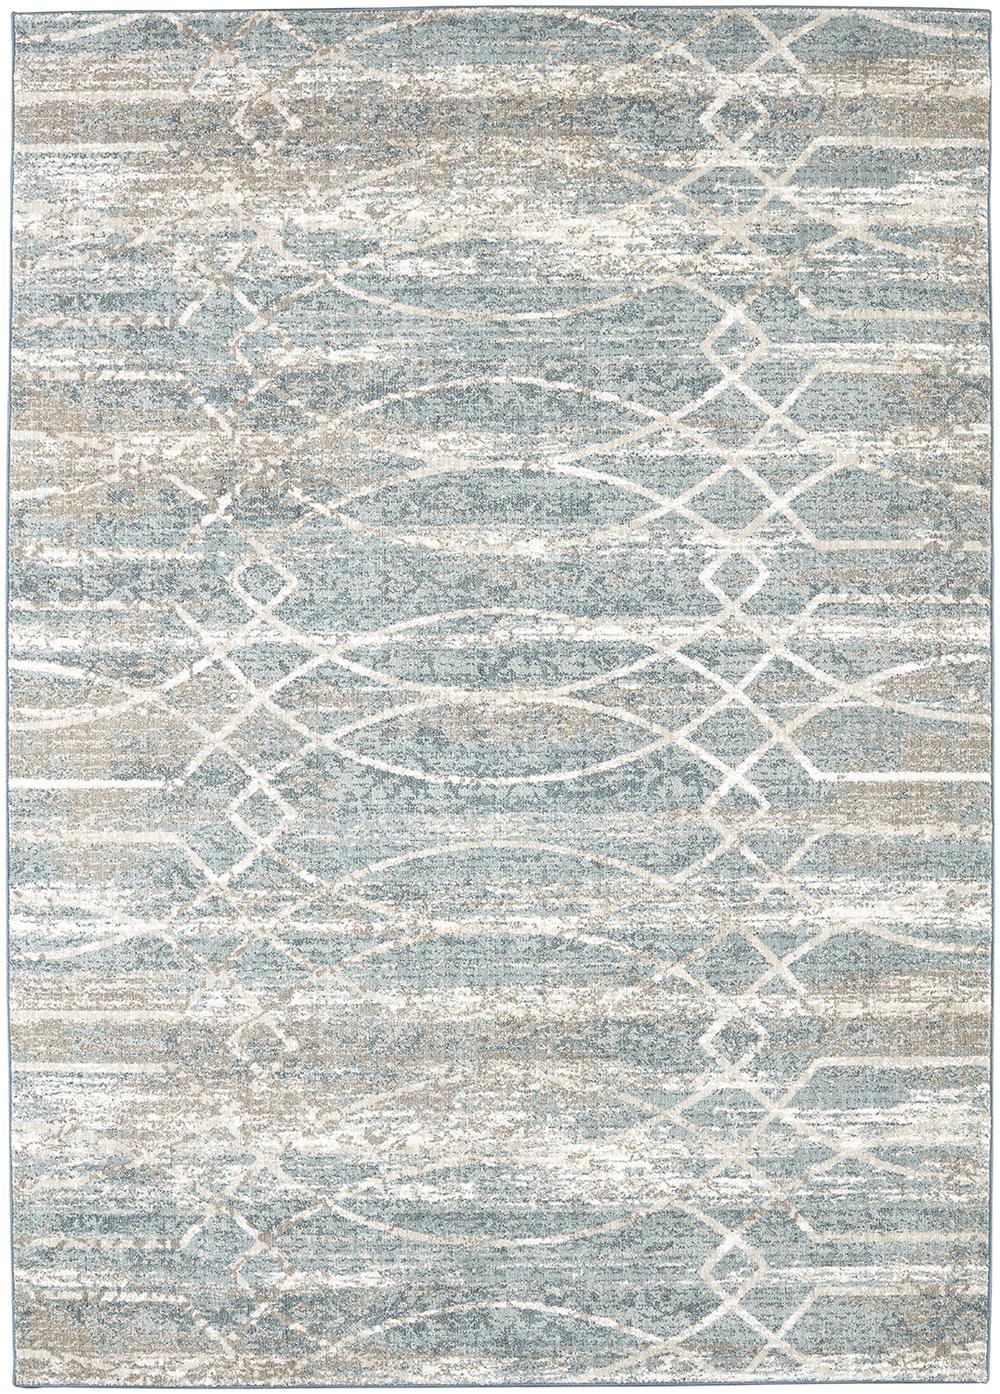 Karastan Touchstone Debonair Jadeite by Virginia Langley Bone White Rug